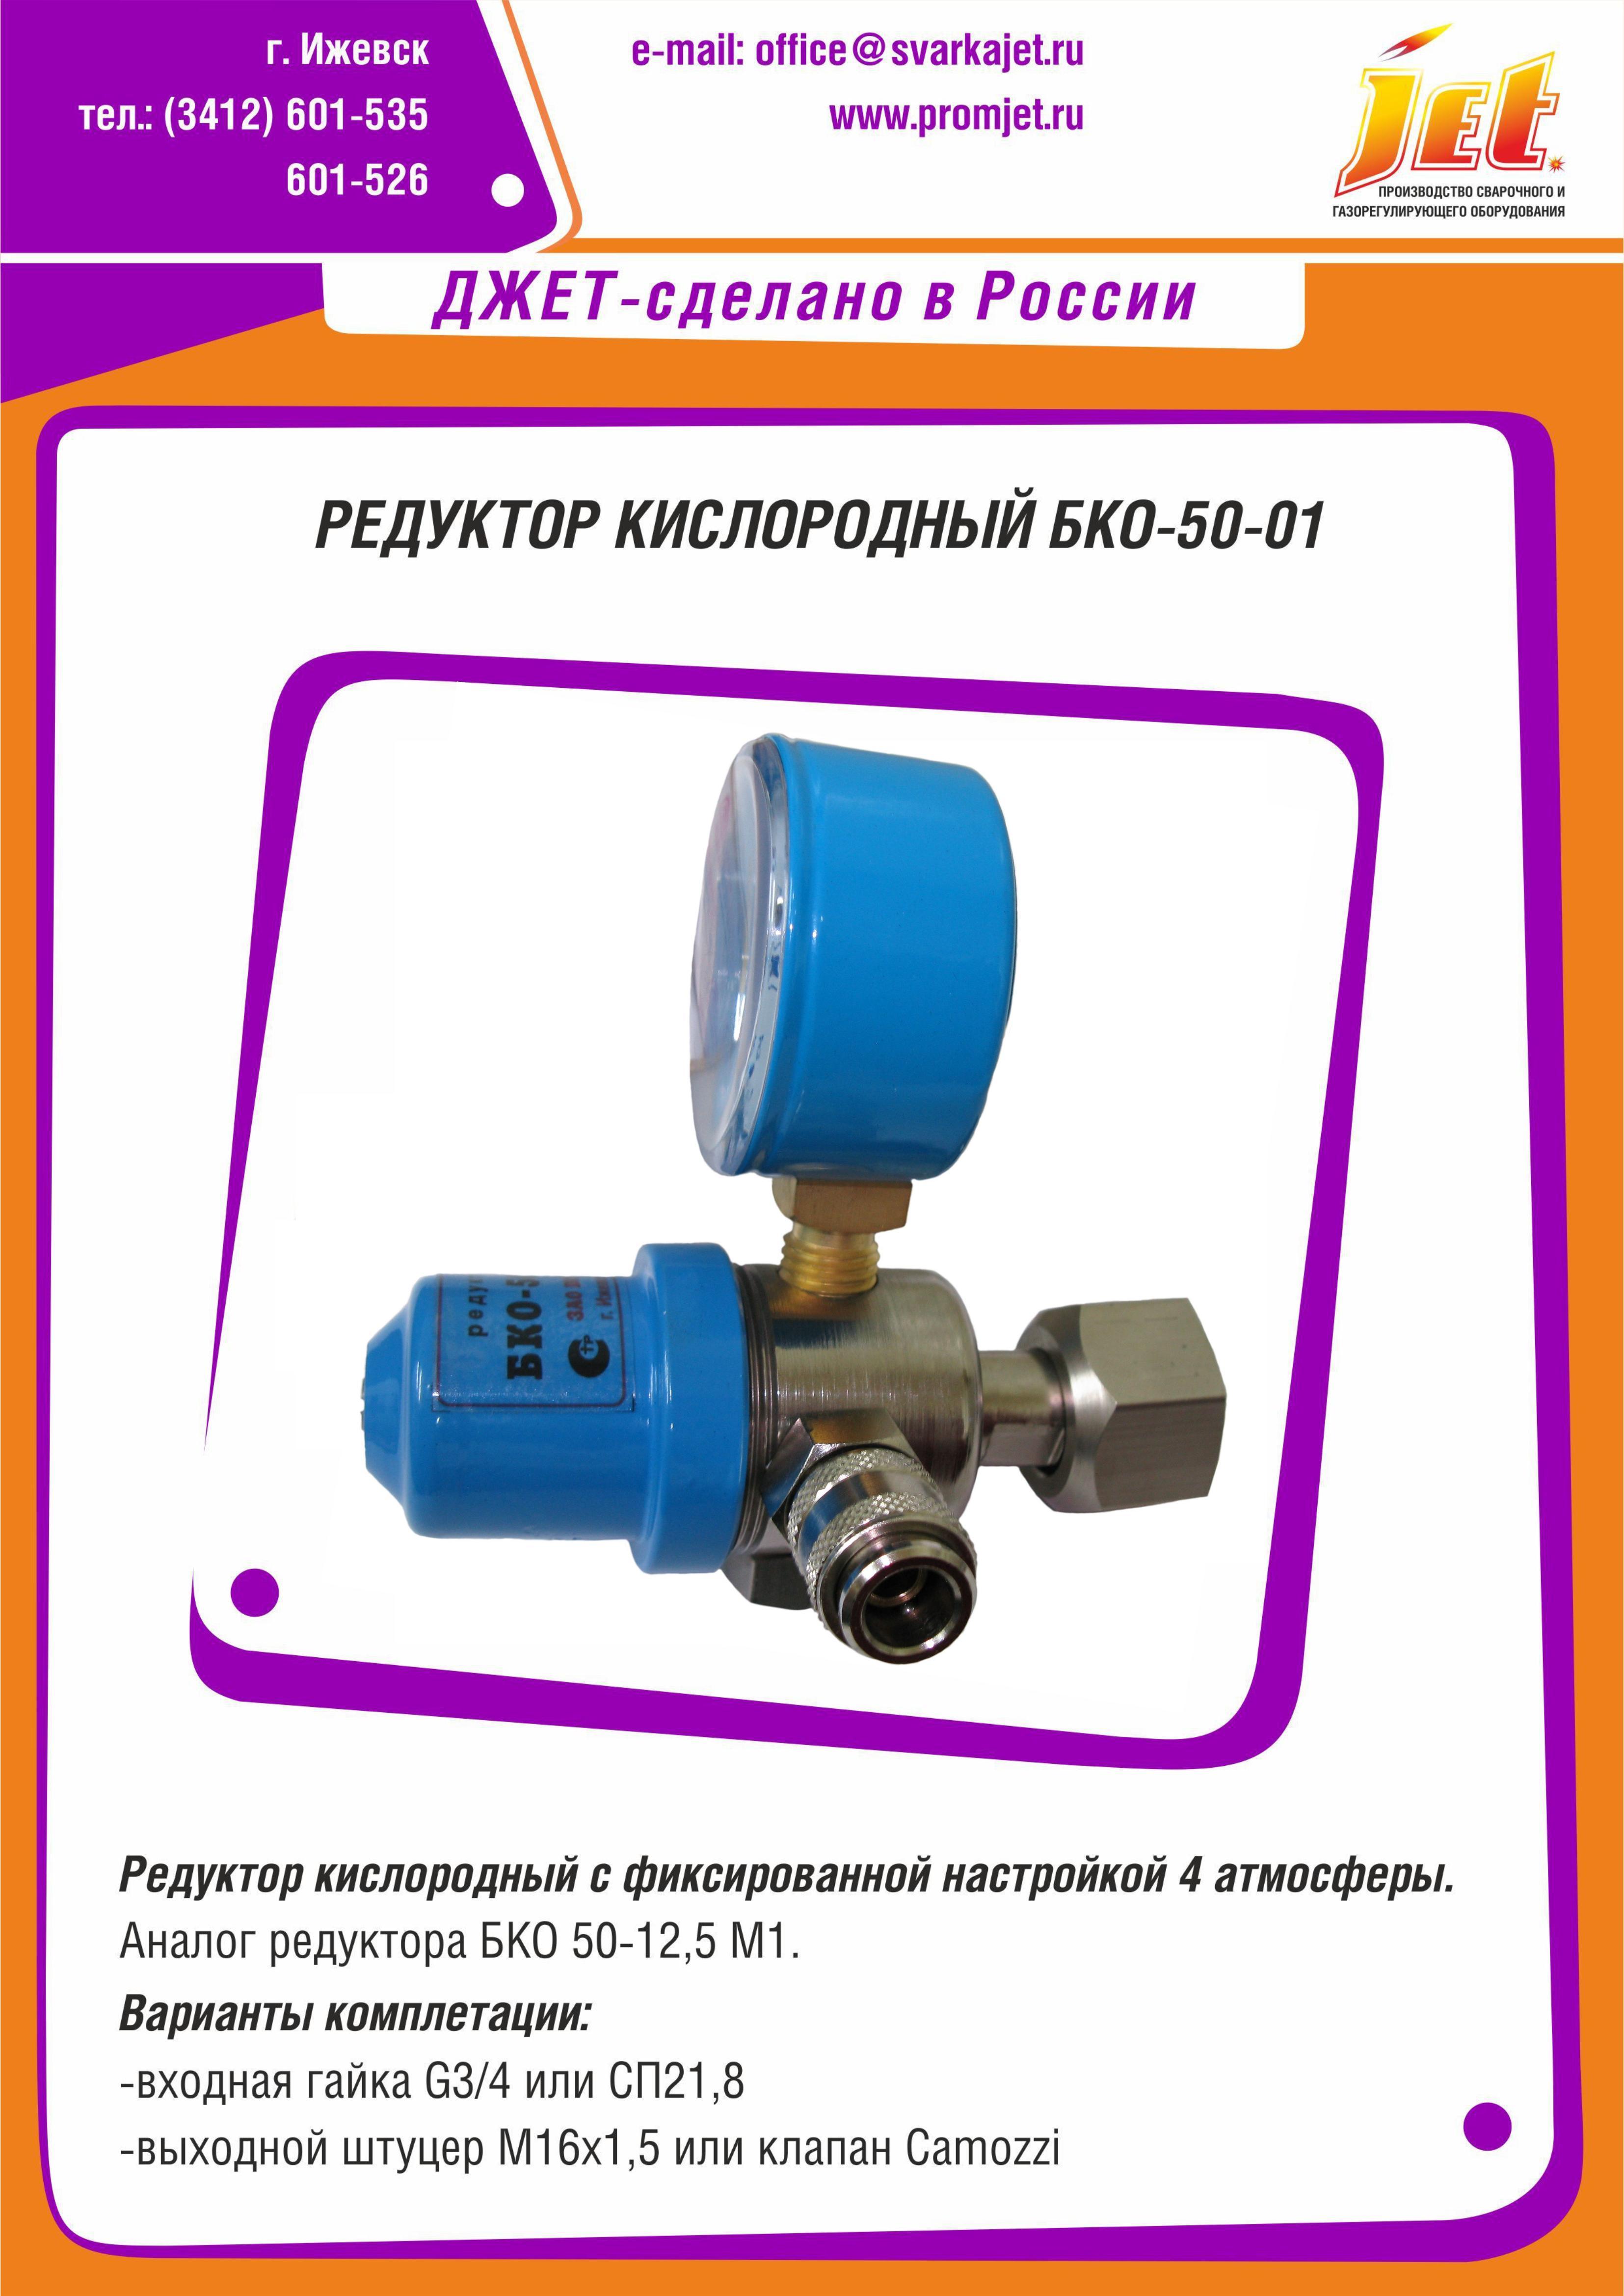 №9 БКО-50-01